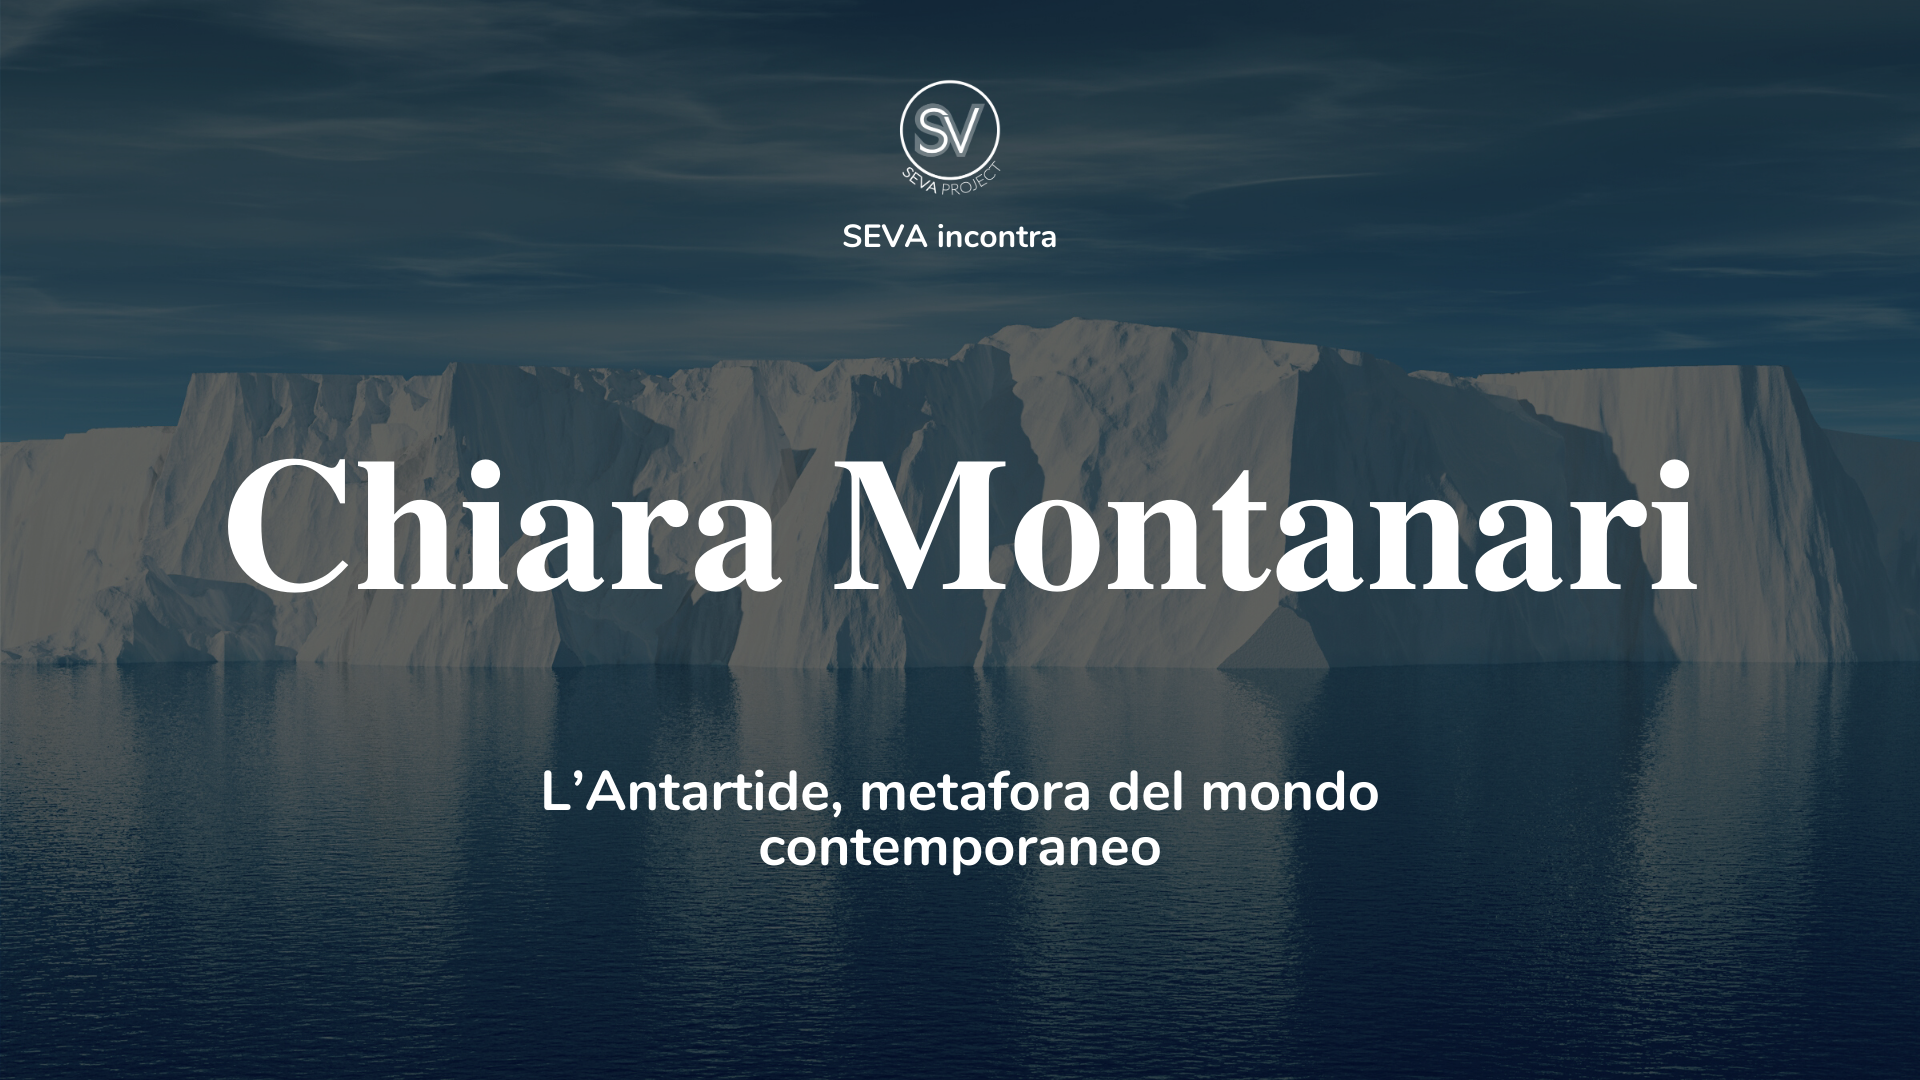 SEVA incontra Chiara Montanari: L'Antartide, metafora del mondo contemporaneo